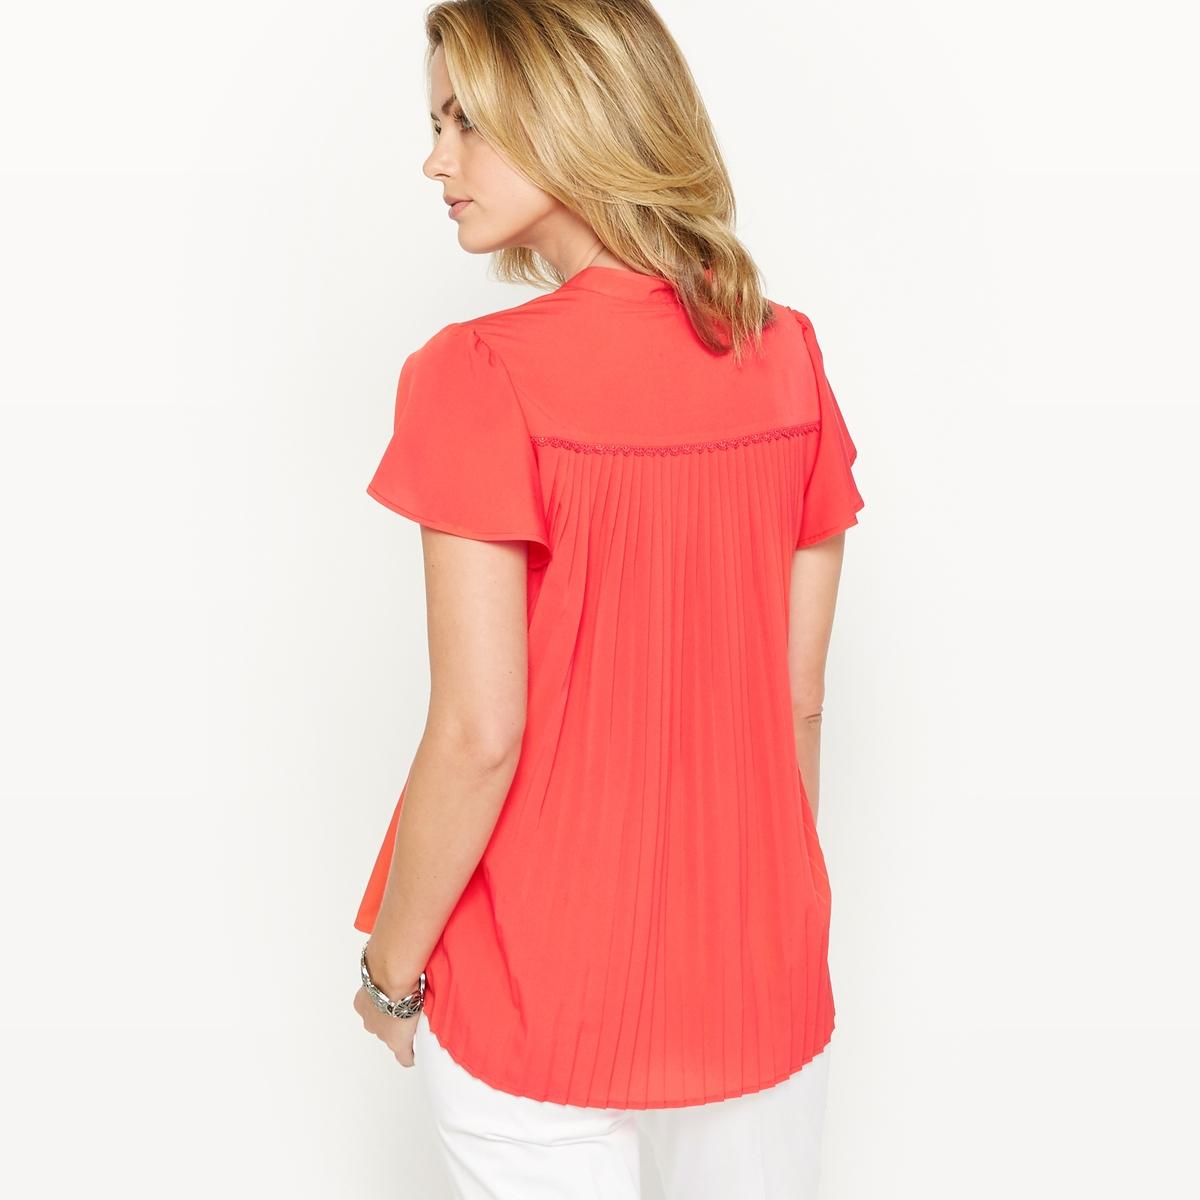 Блузка из крепа с плиссировкой на спине от ANNE WEYBURN